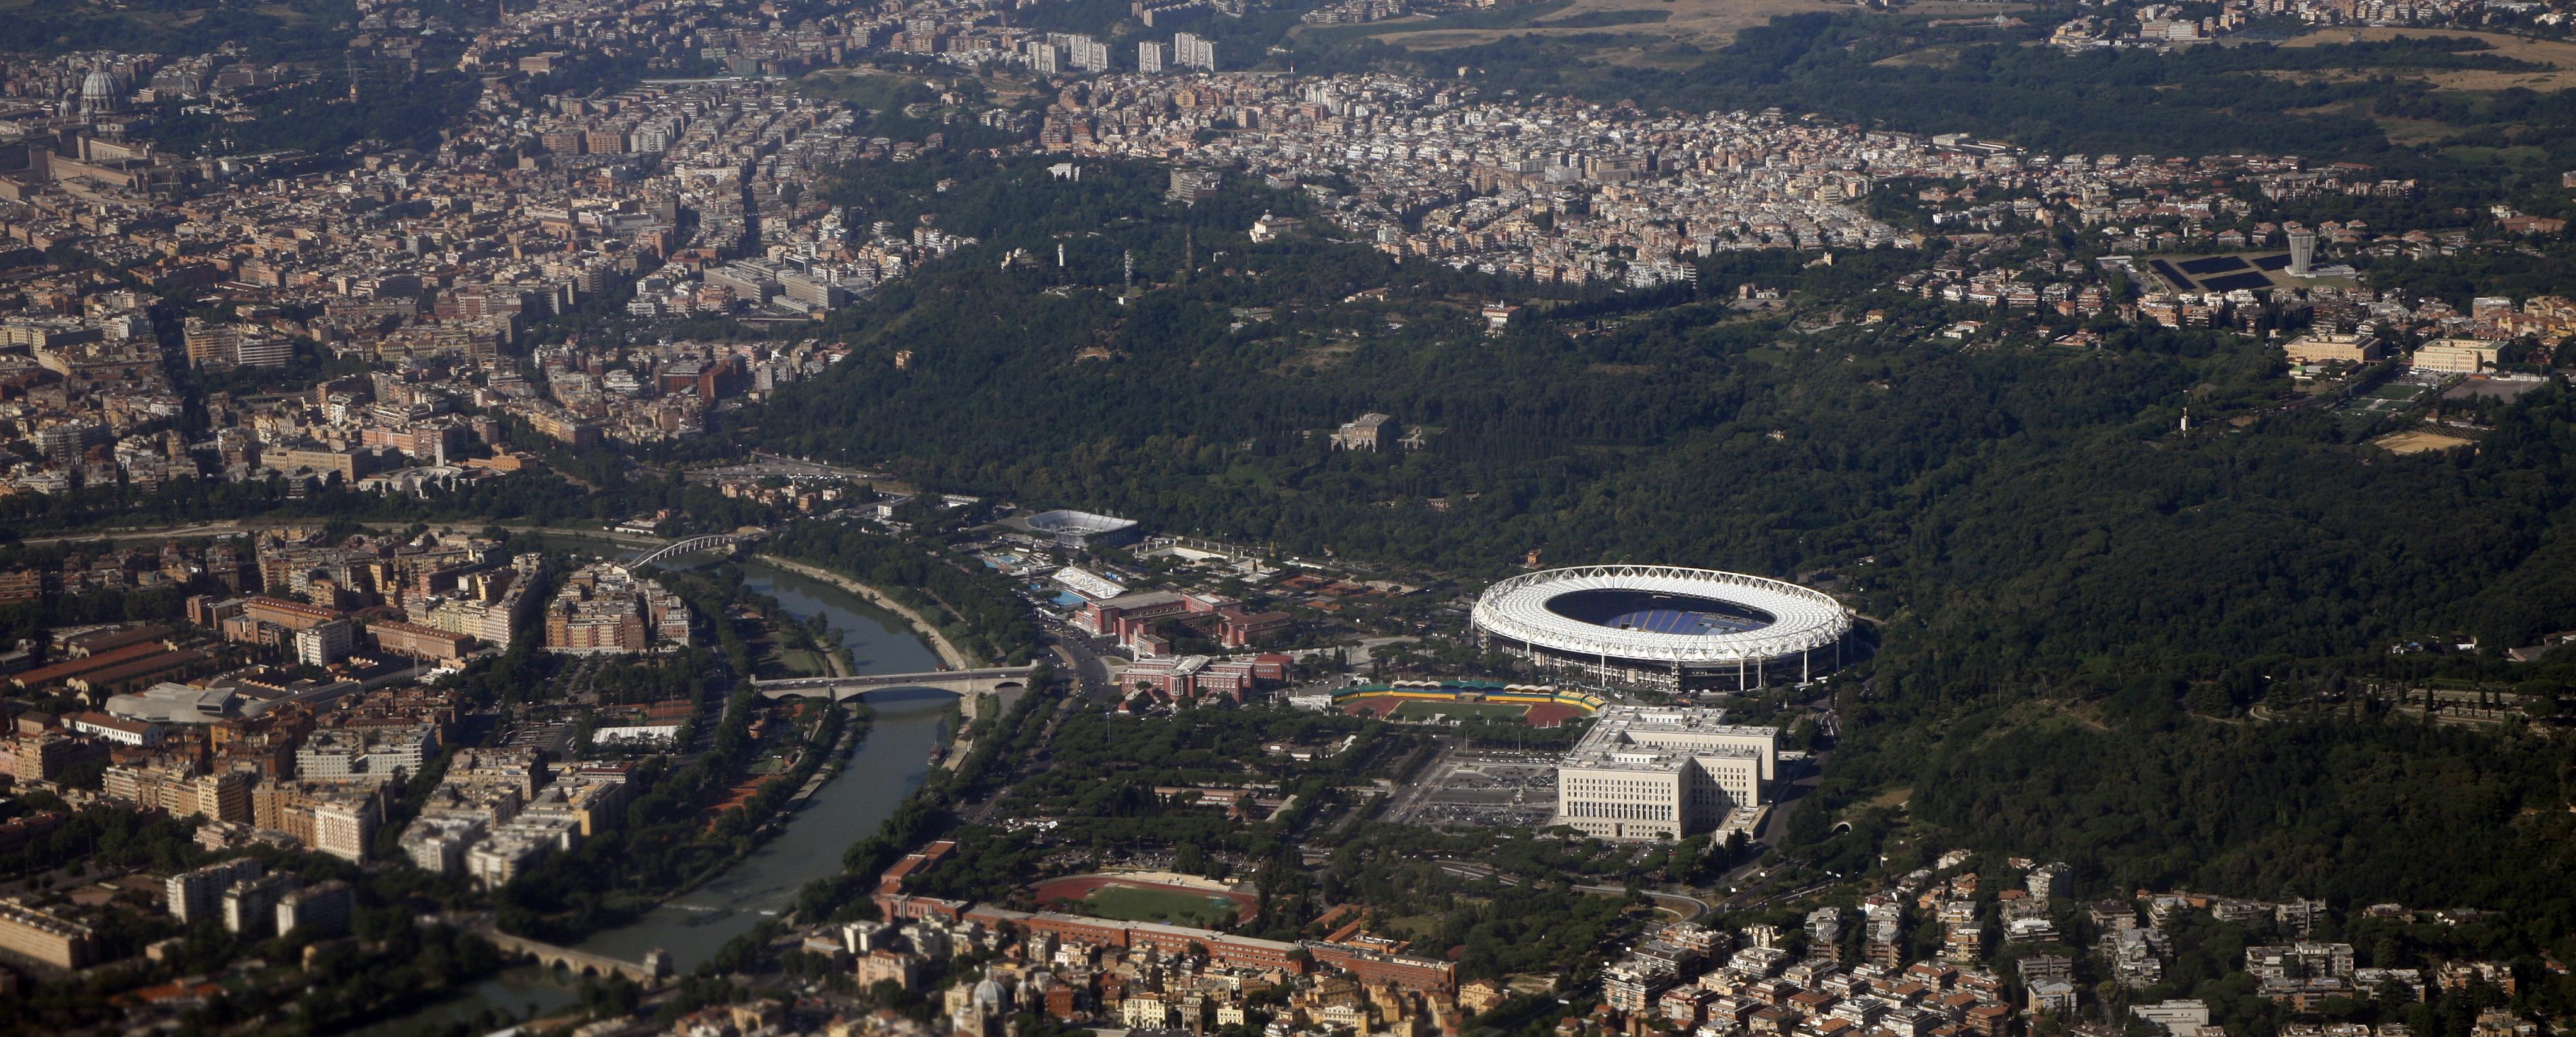 http://www.carrazza.it/wp-content/uploads/2016/12/21-Veduta-oggi-Stadio-Olimpico-4.jpg